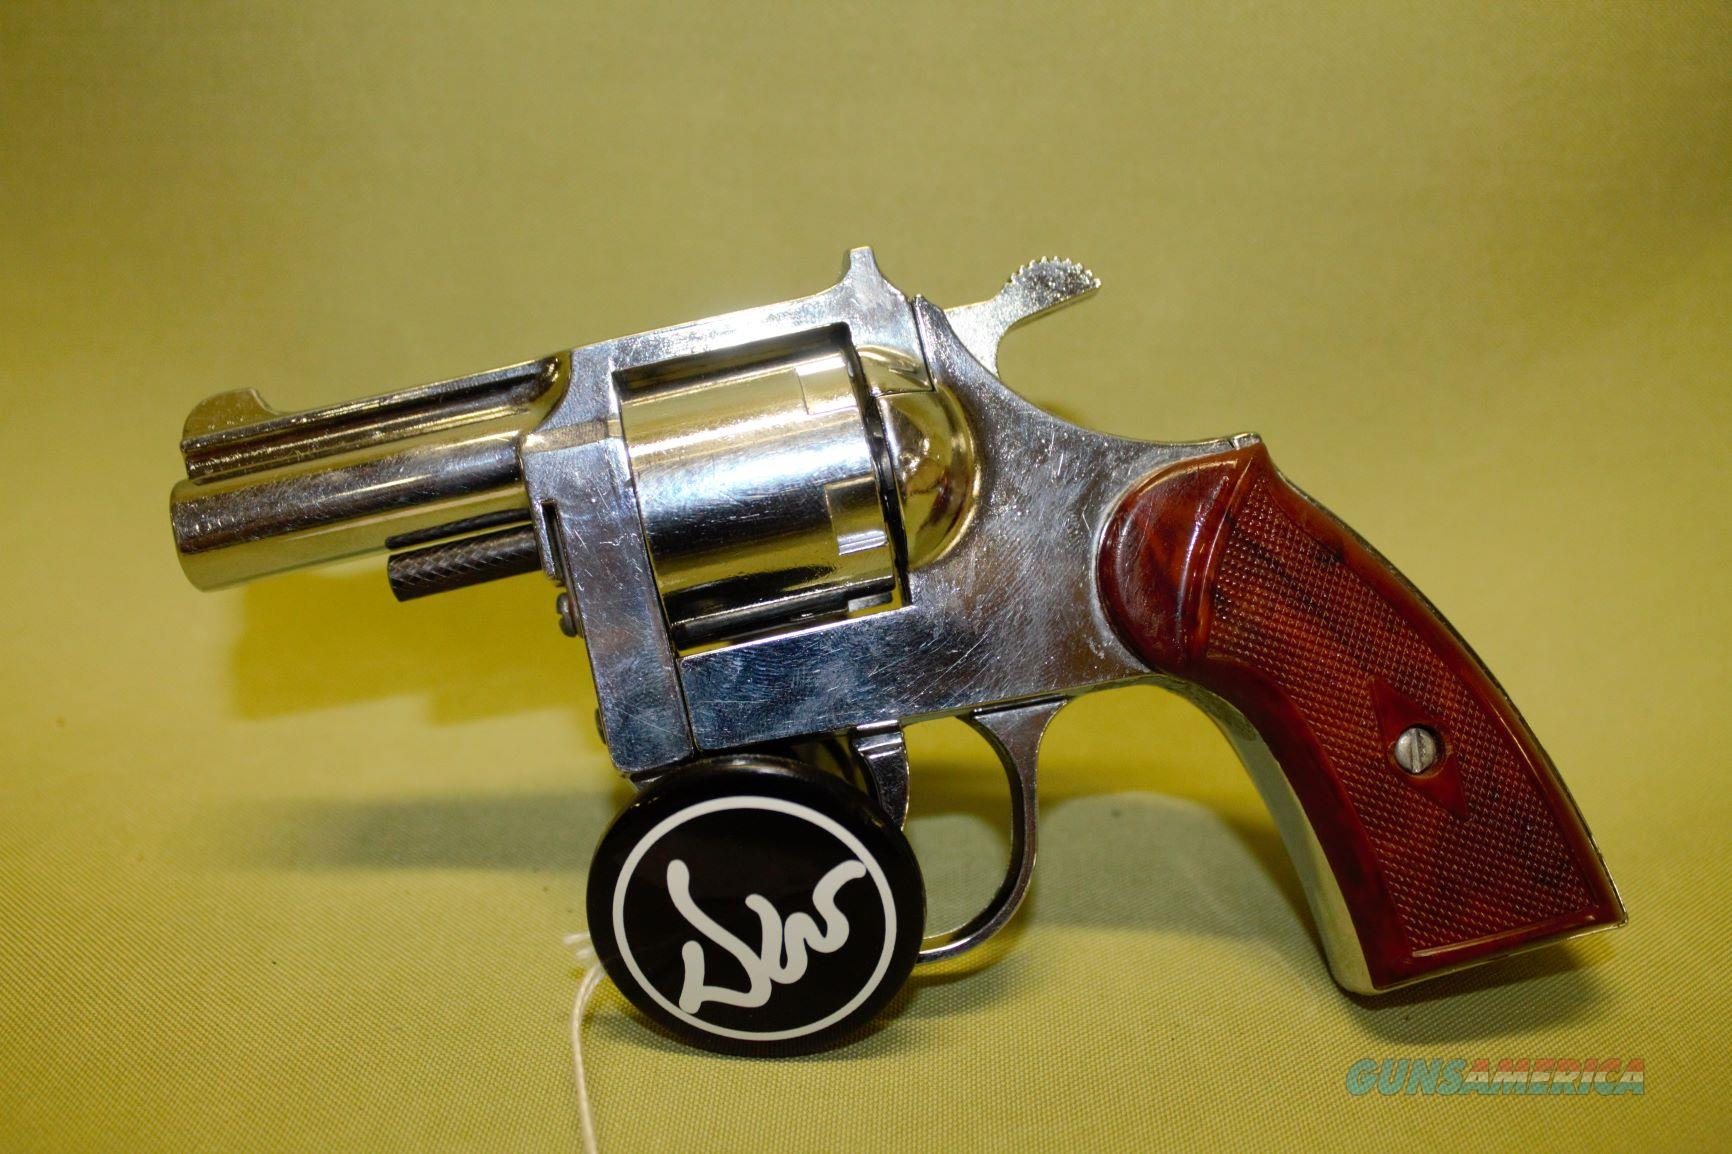 Clerke Technicore 22 LR  Guns > Pistols > C Misc Pistols